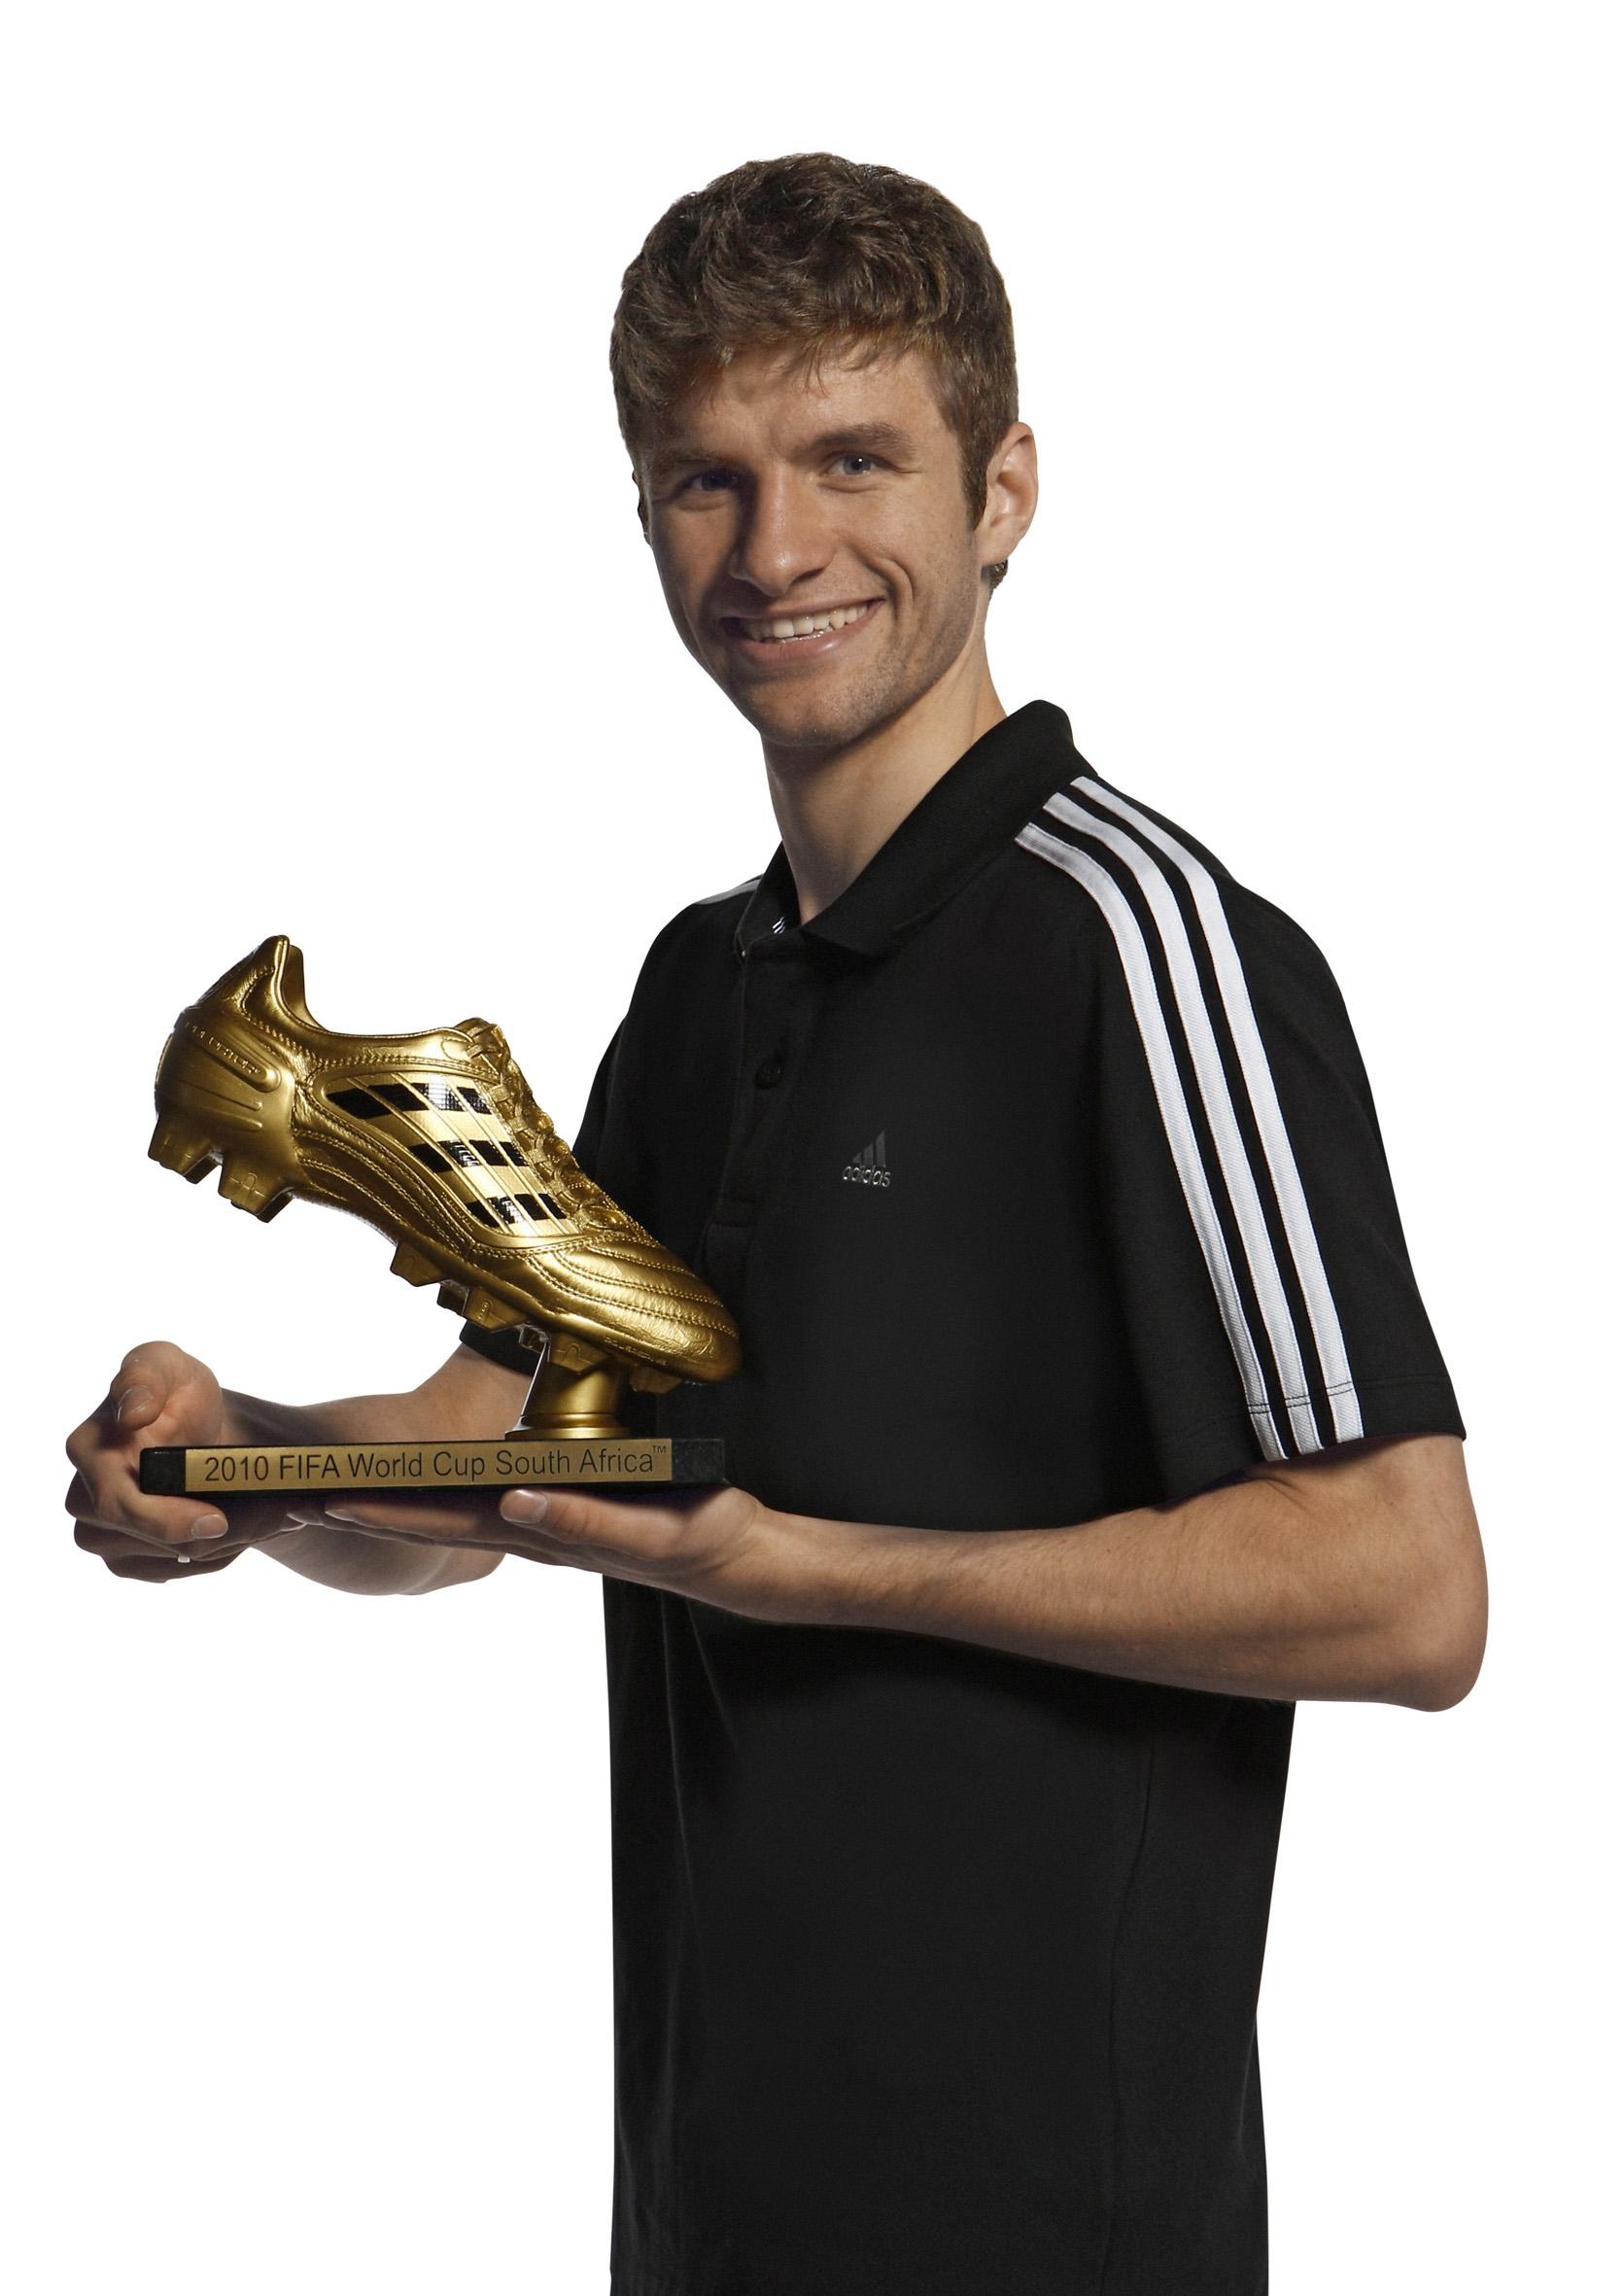 Brazil 2014 Golden Boot Contenders